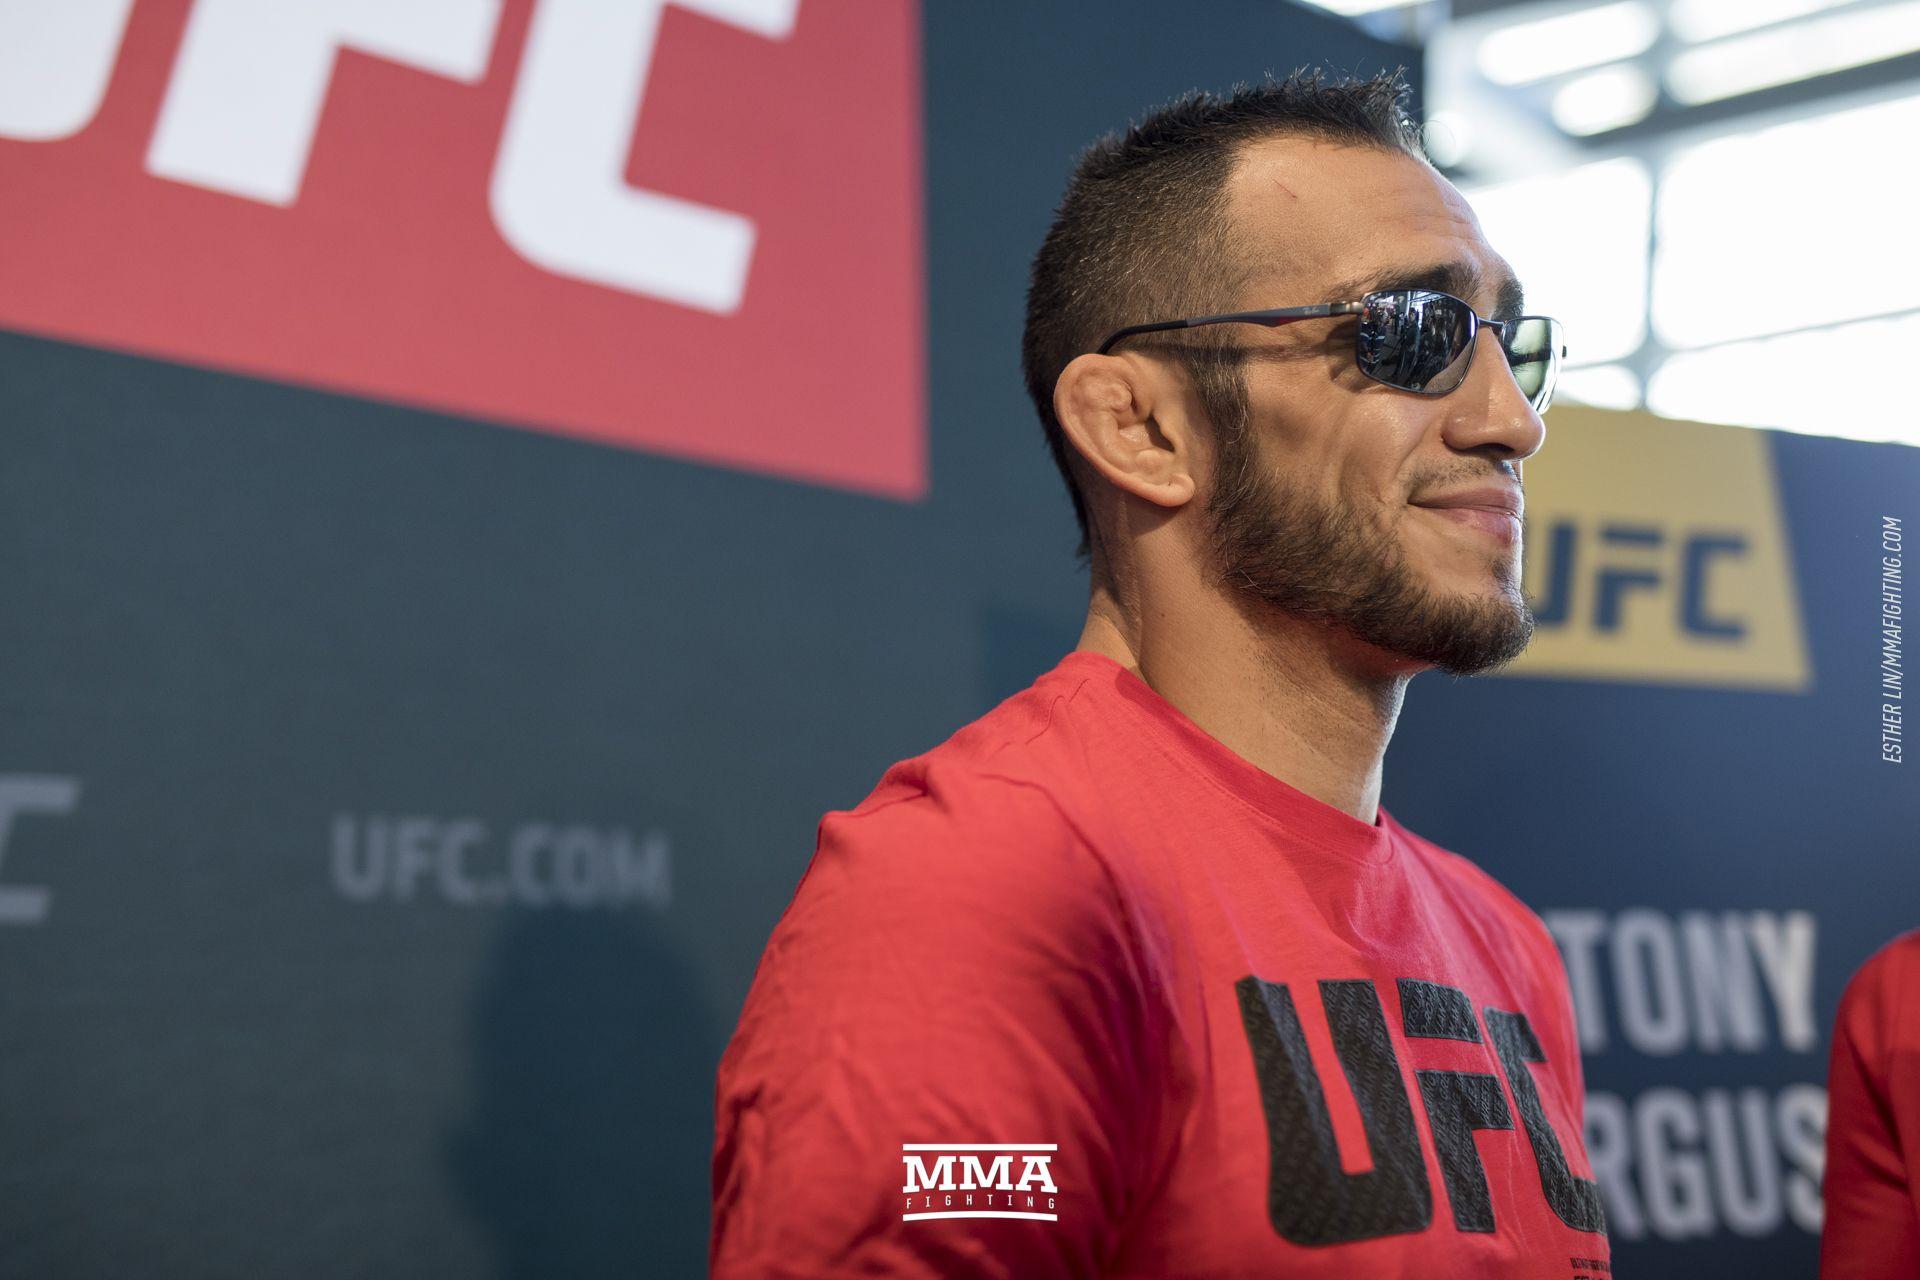 UFC 216 media day photos